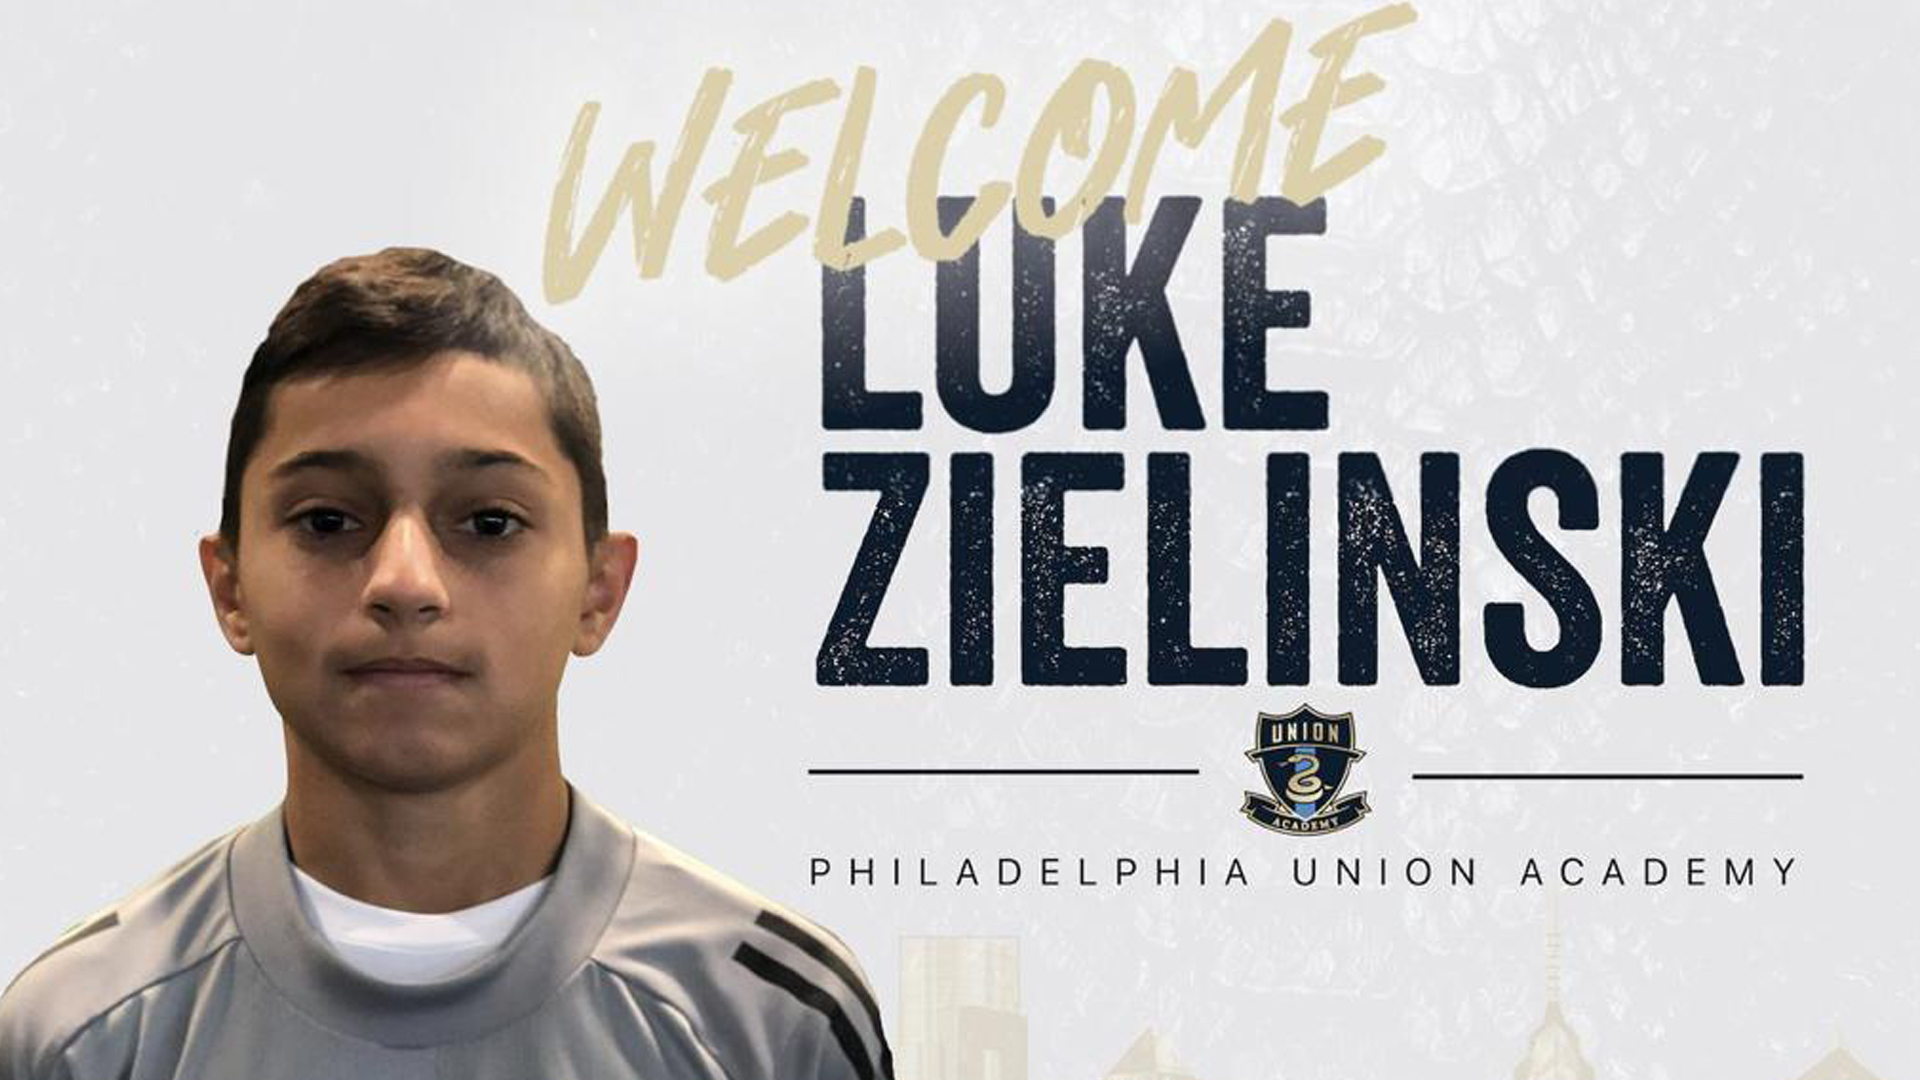 NCE-Soccer-graduate-Luke-Zielinski-commits-to-Philadelphia-Union-Academy